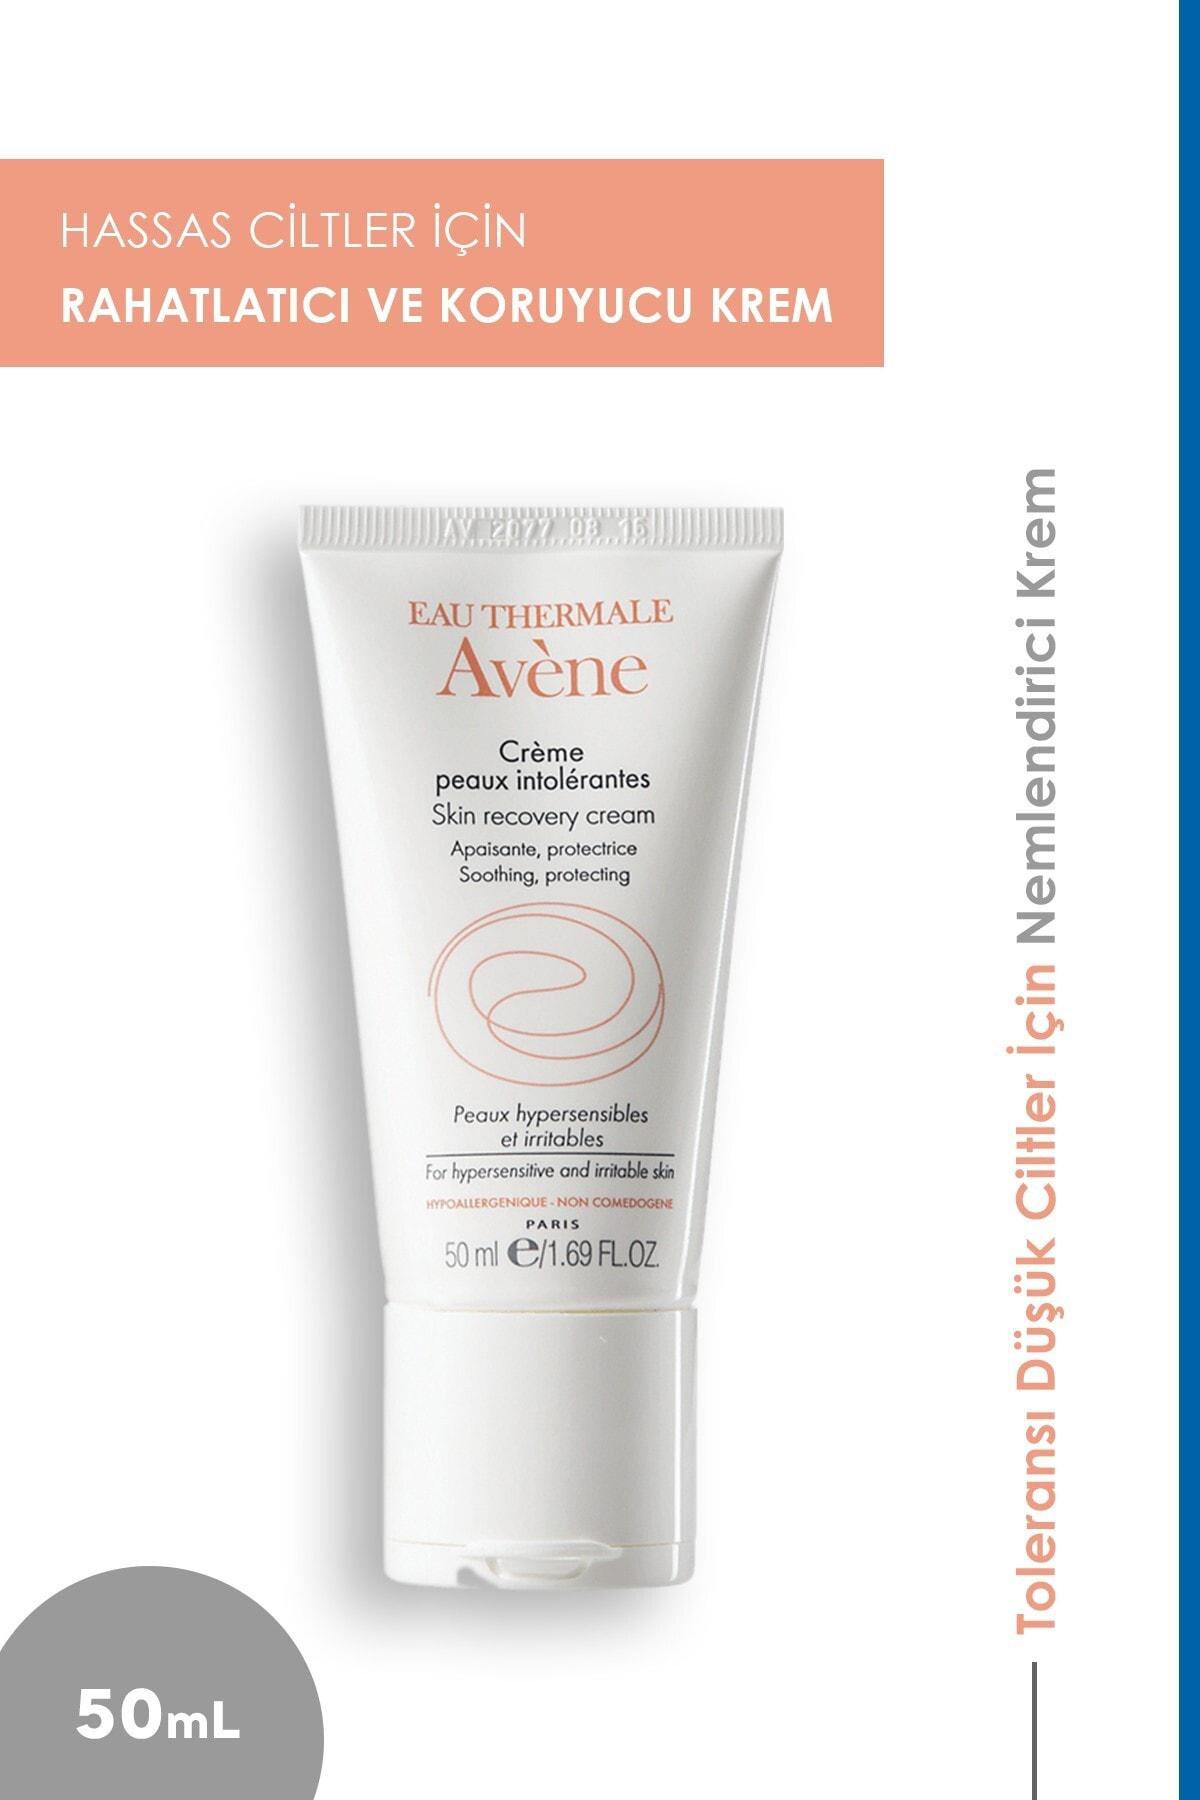 Avene Creme Peaux Intolerantes Skin Recovery Cream - Bakım Kremi 50ml 1